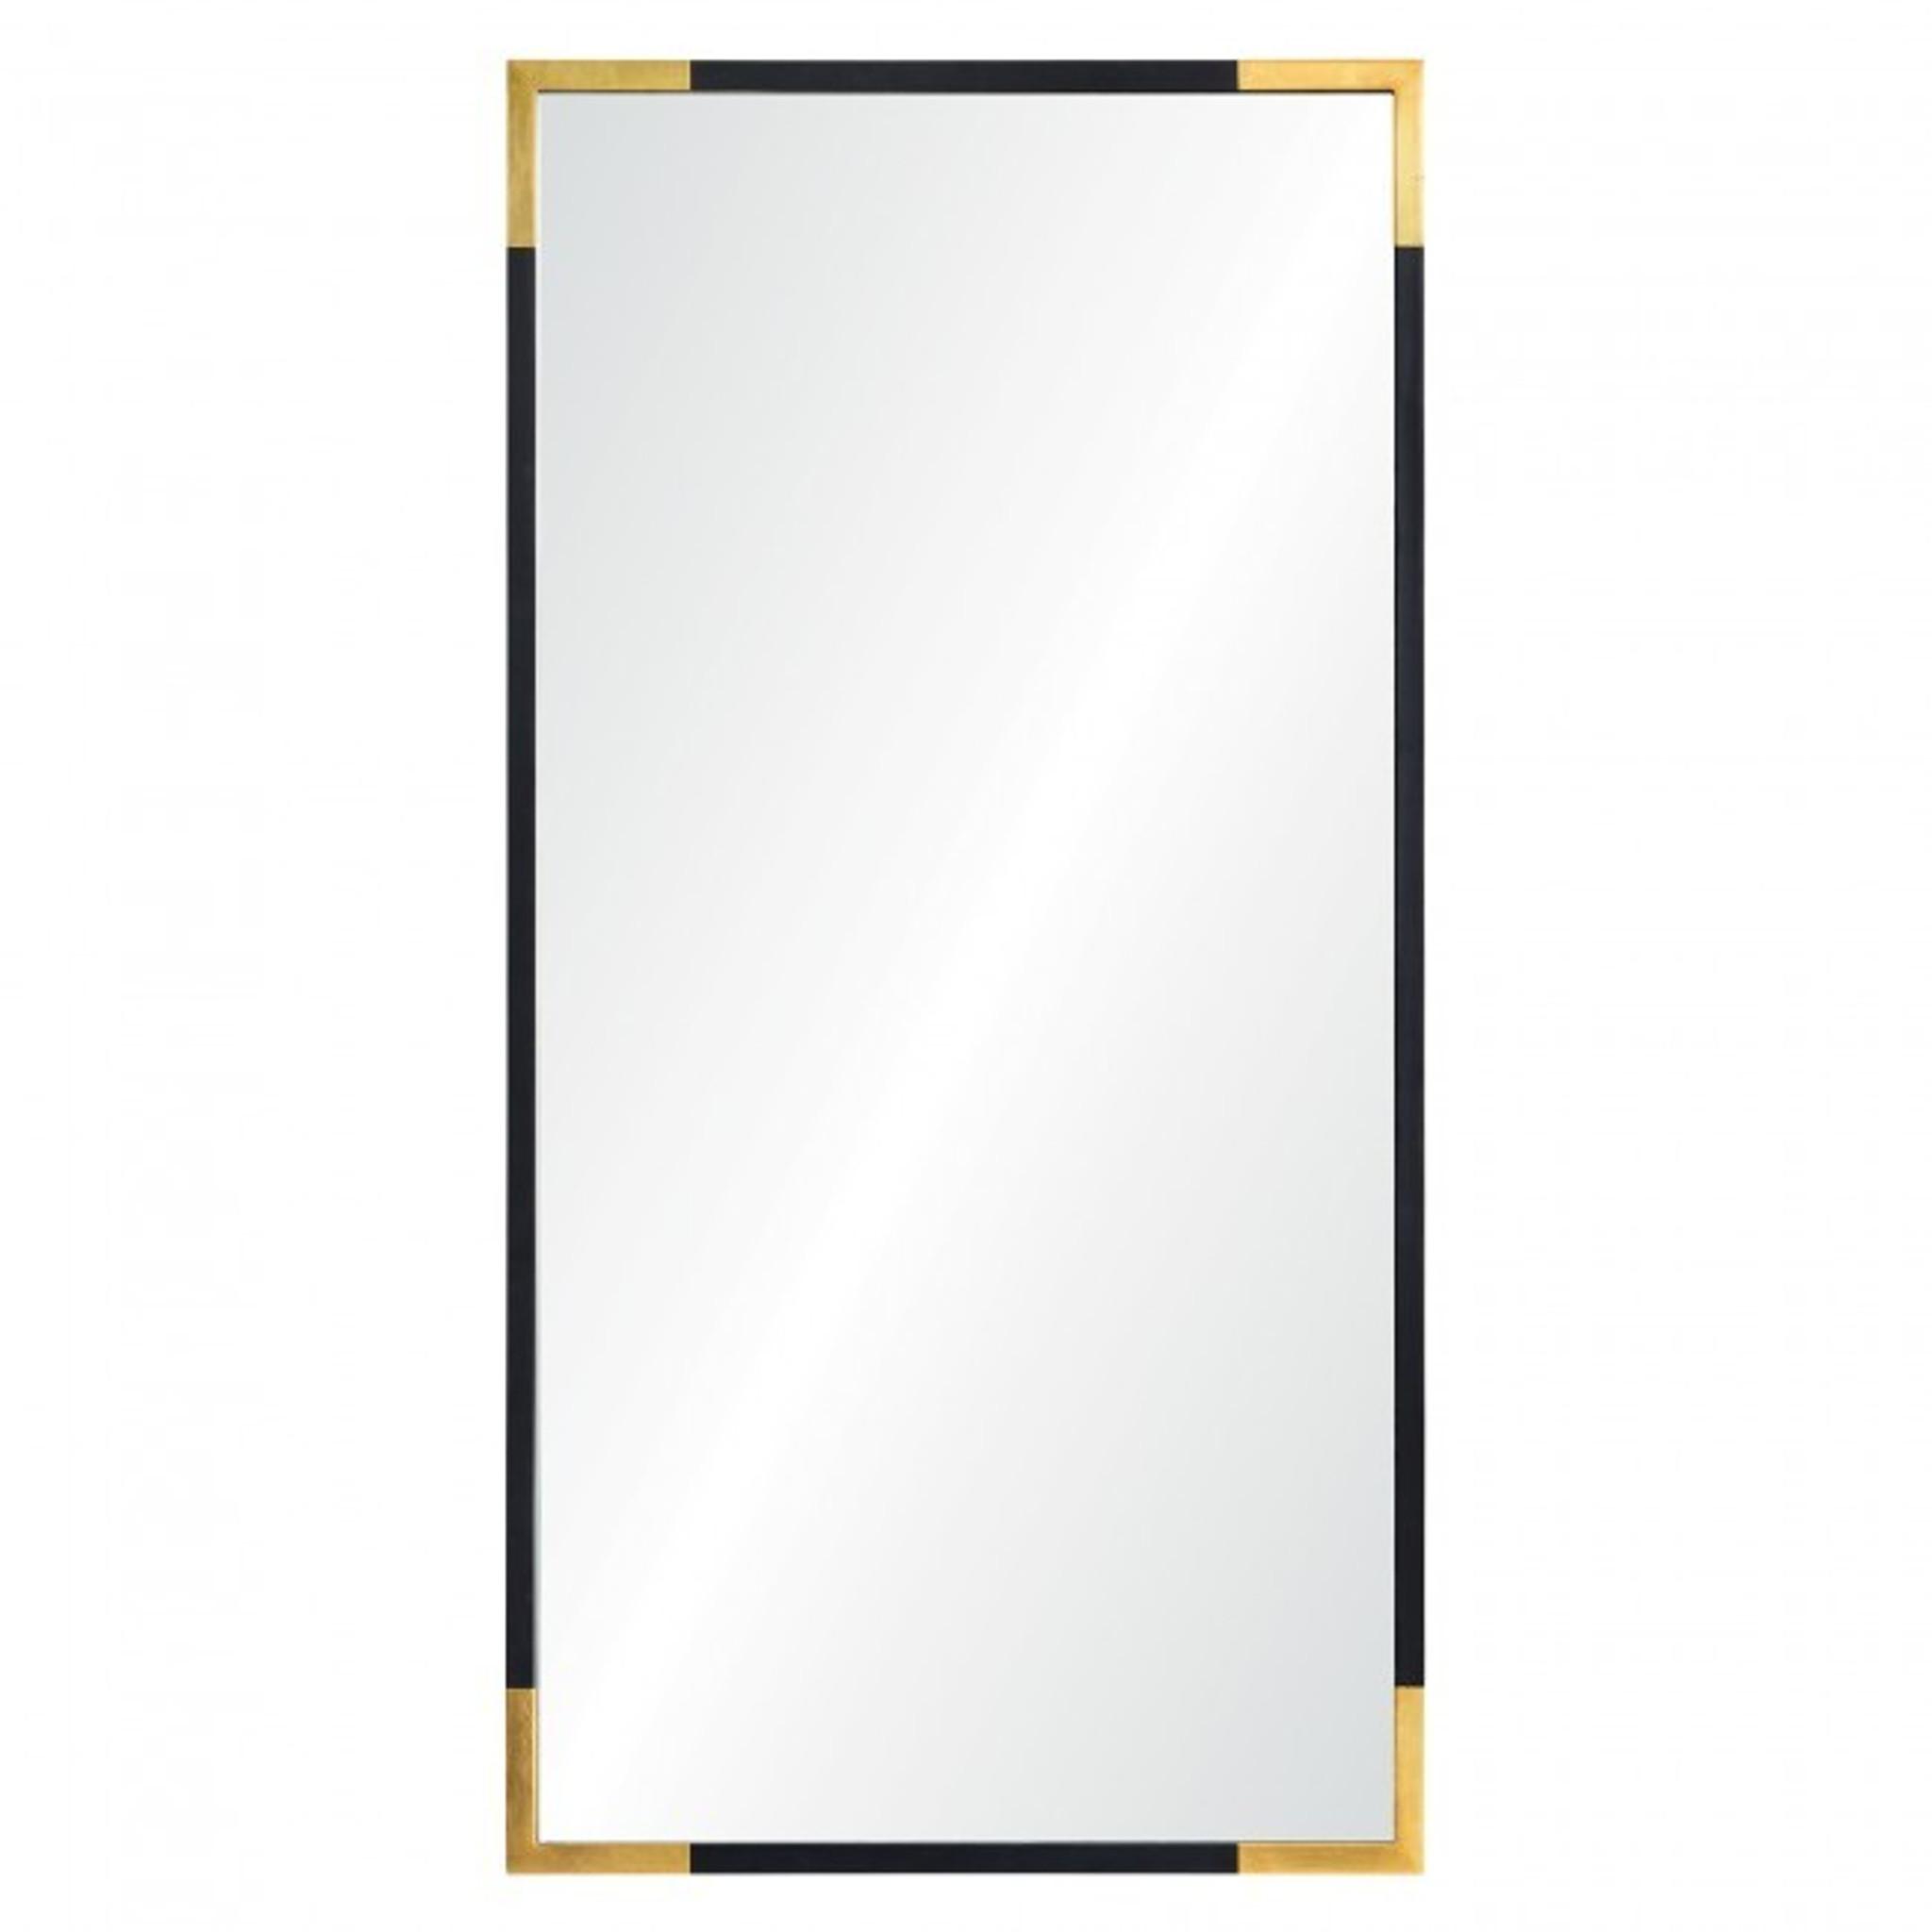 rectangular wall mirror décor renwil Osmond black and gold sleek modern bathroom powder room wall